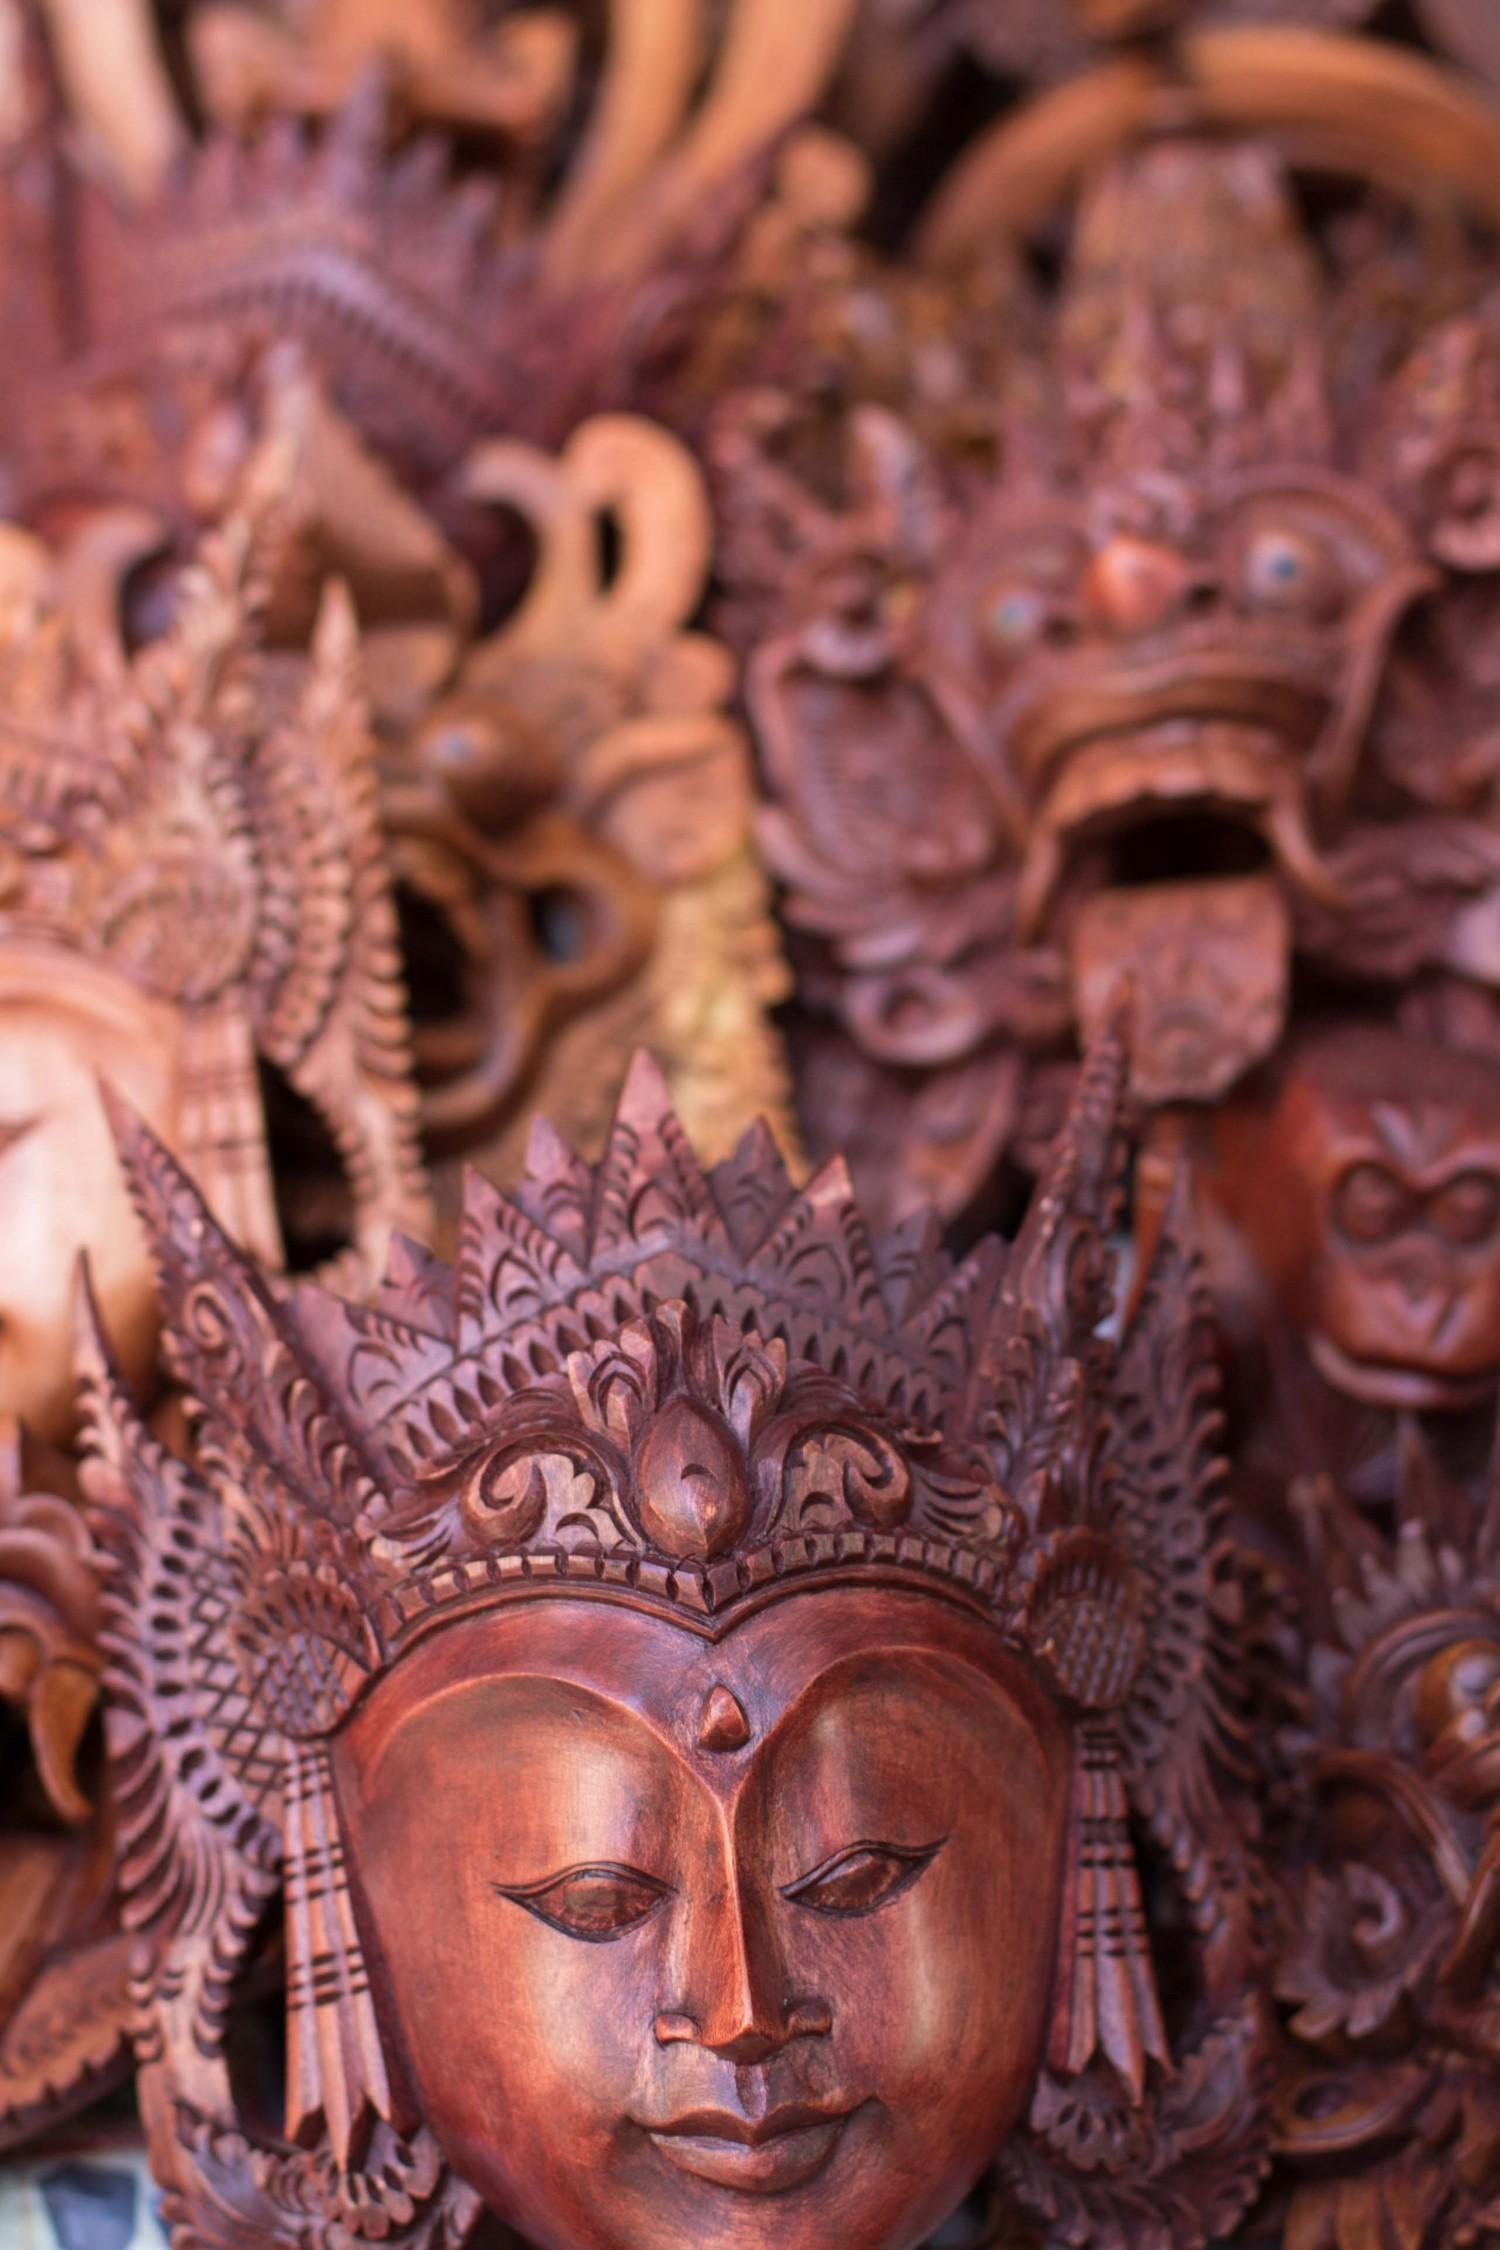 zakupy shopping Bali Uubd (3)